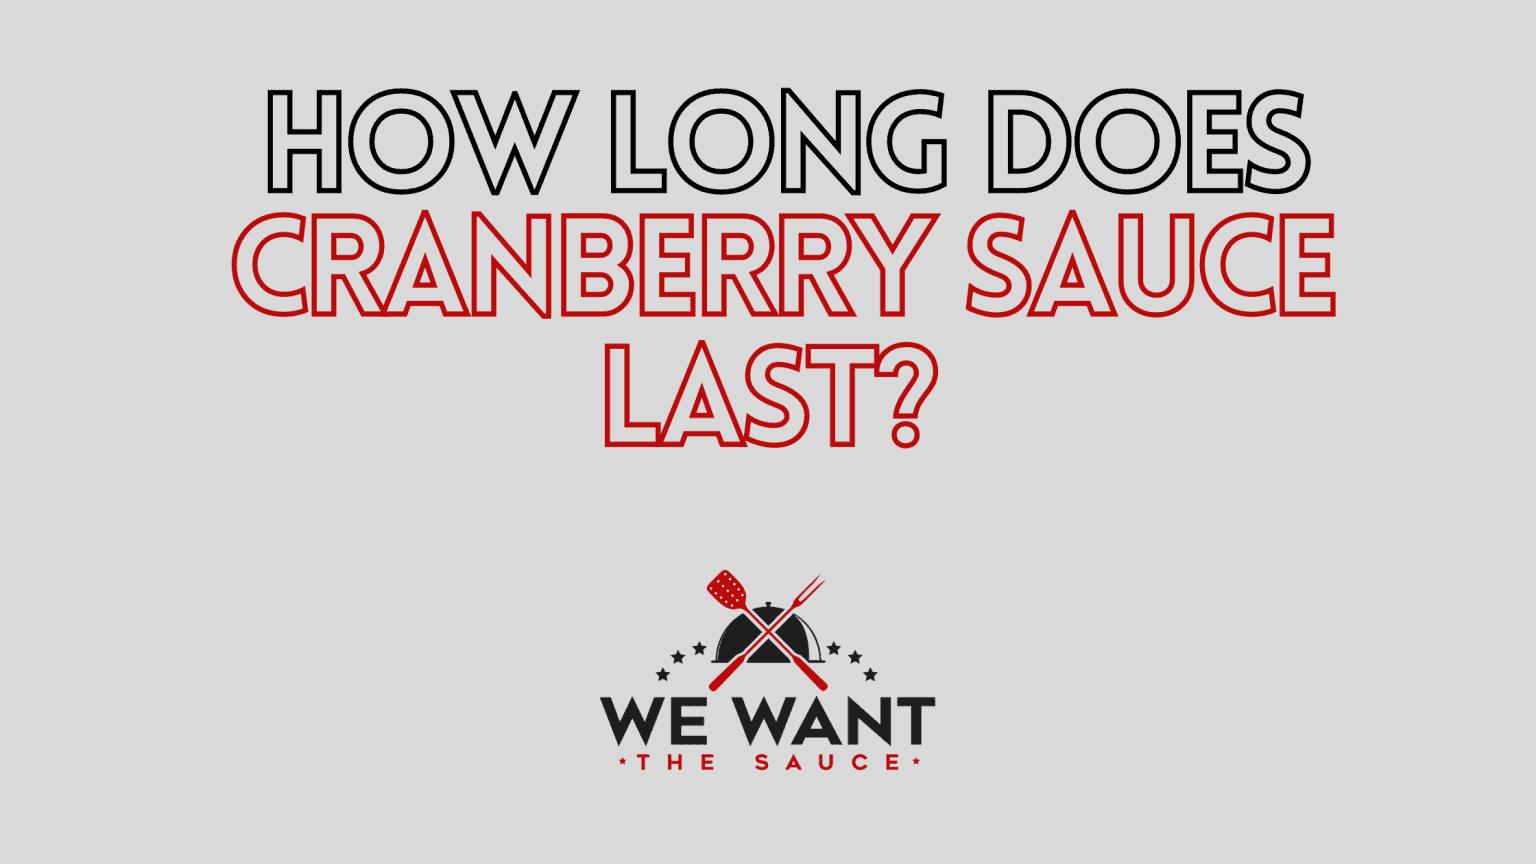 How Long Does Cranberry Sauce Last?